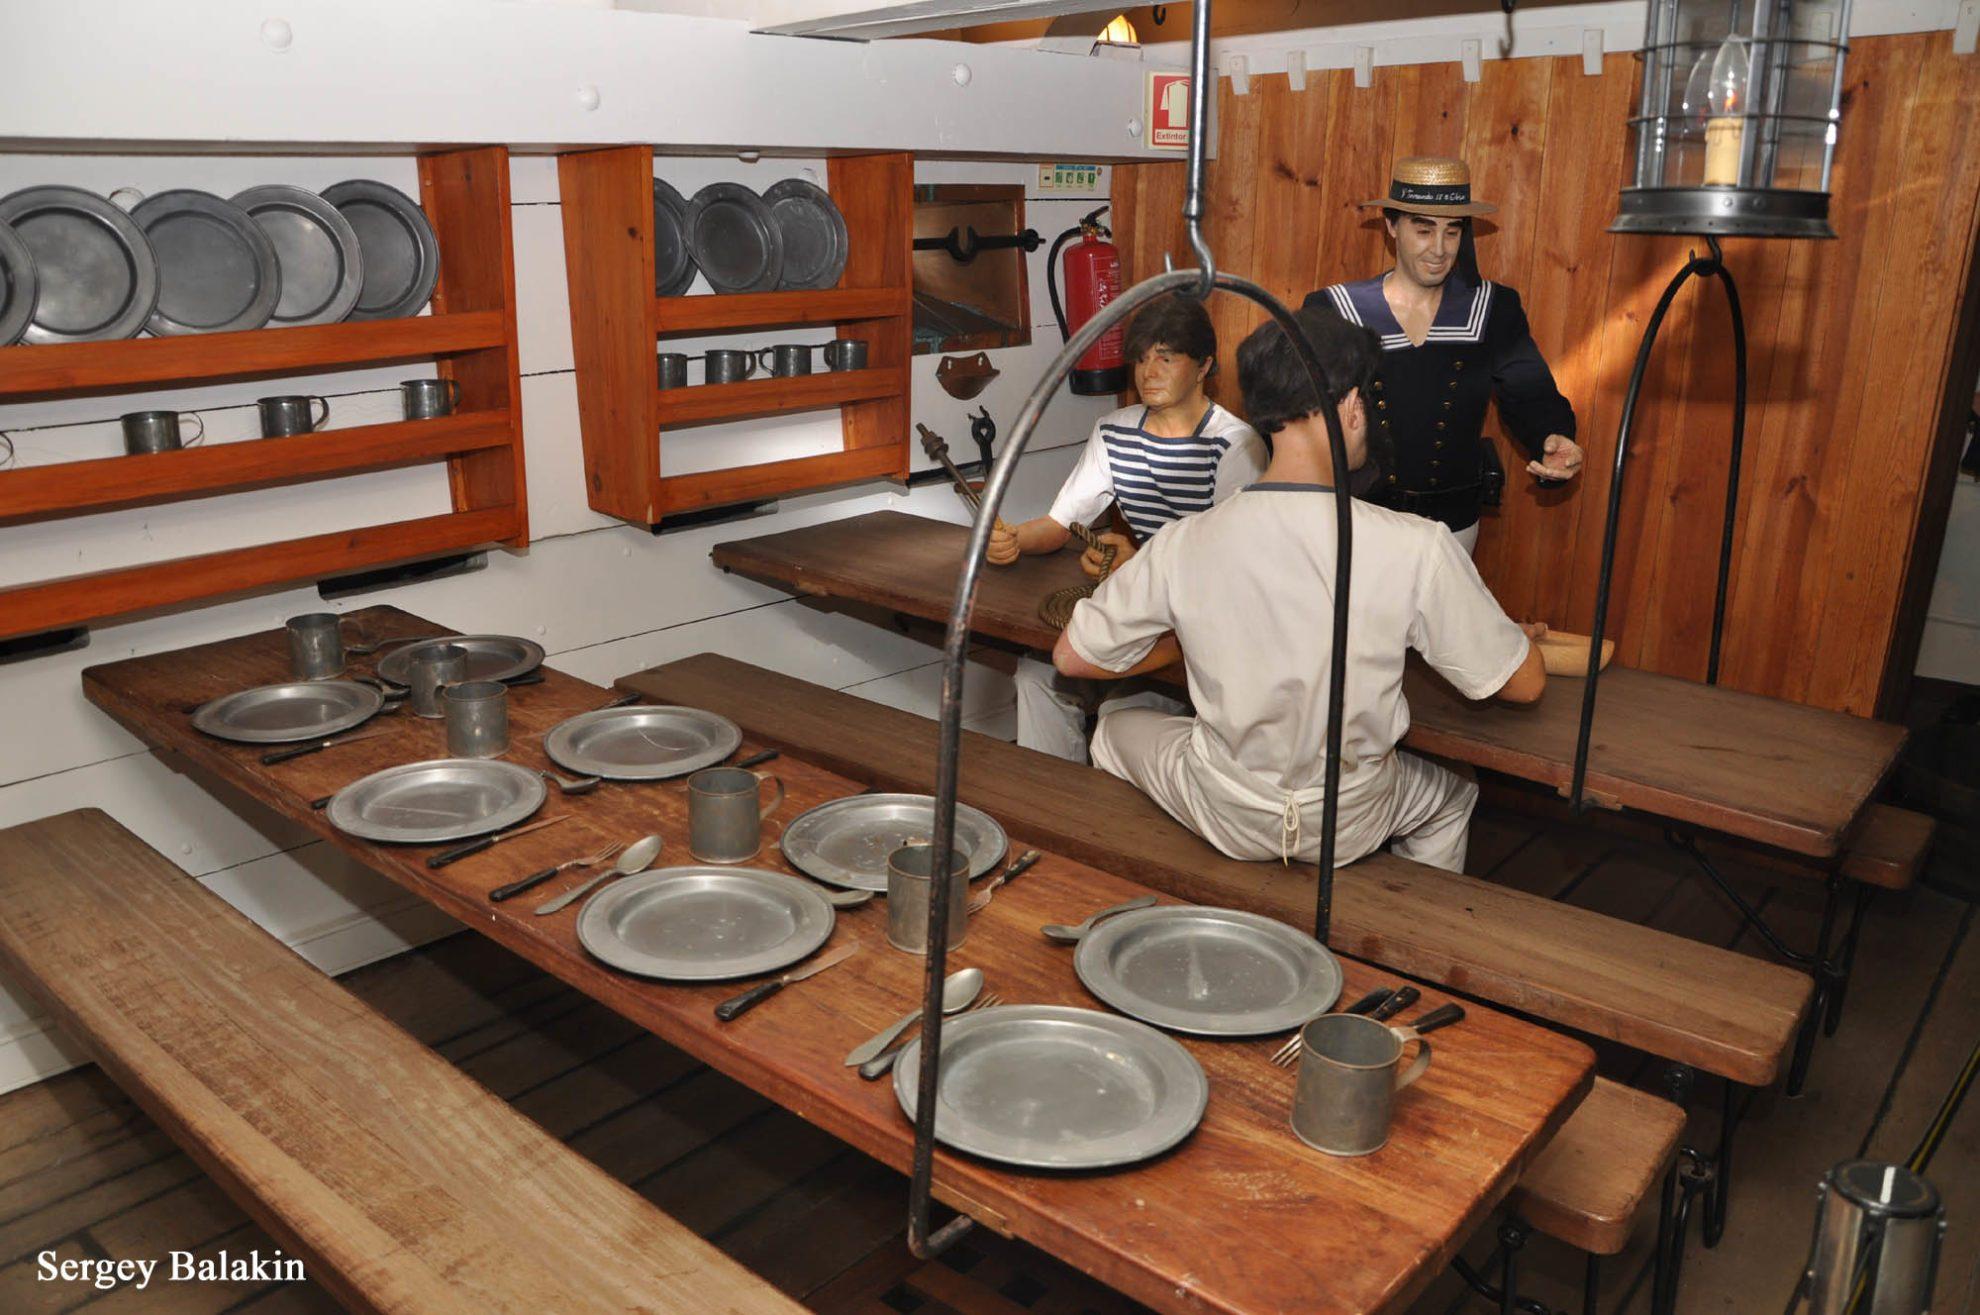 Команда фрегата обедала на съемных полуподвесных столах.